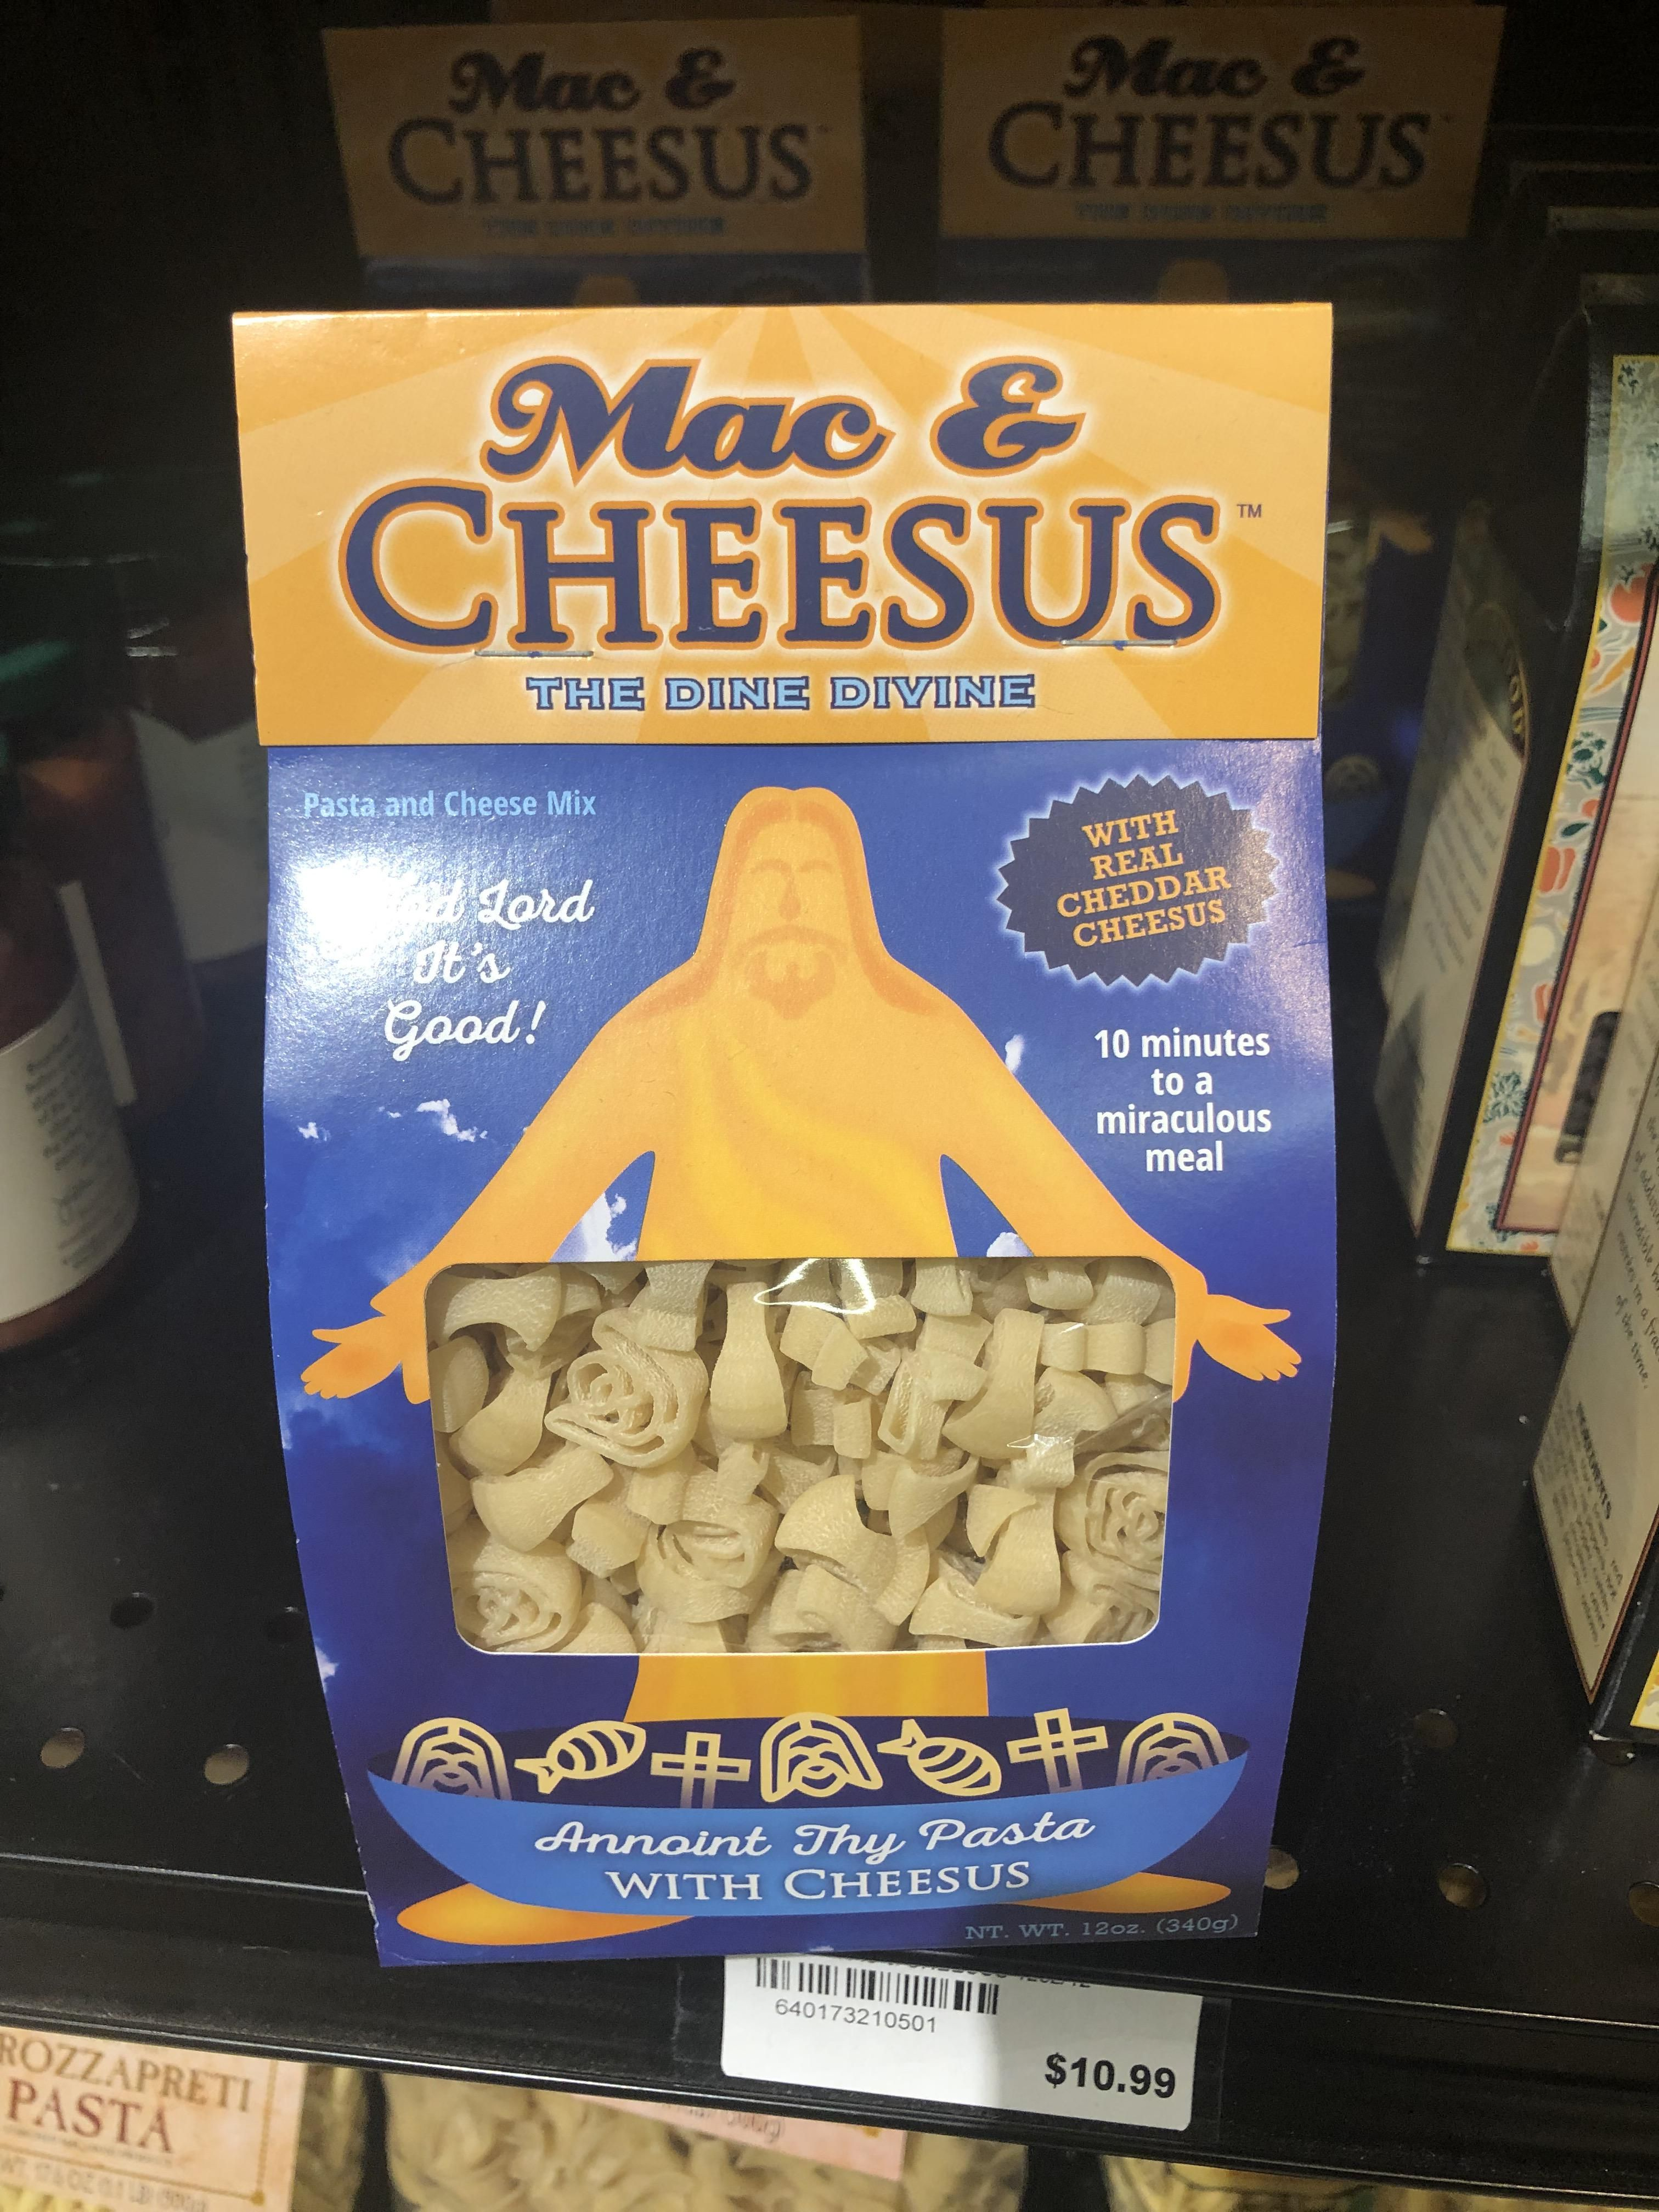 Jesus shapes pasta